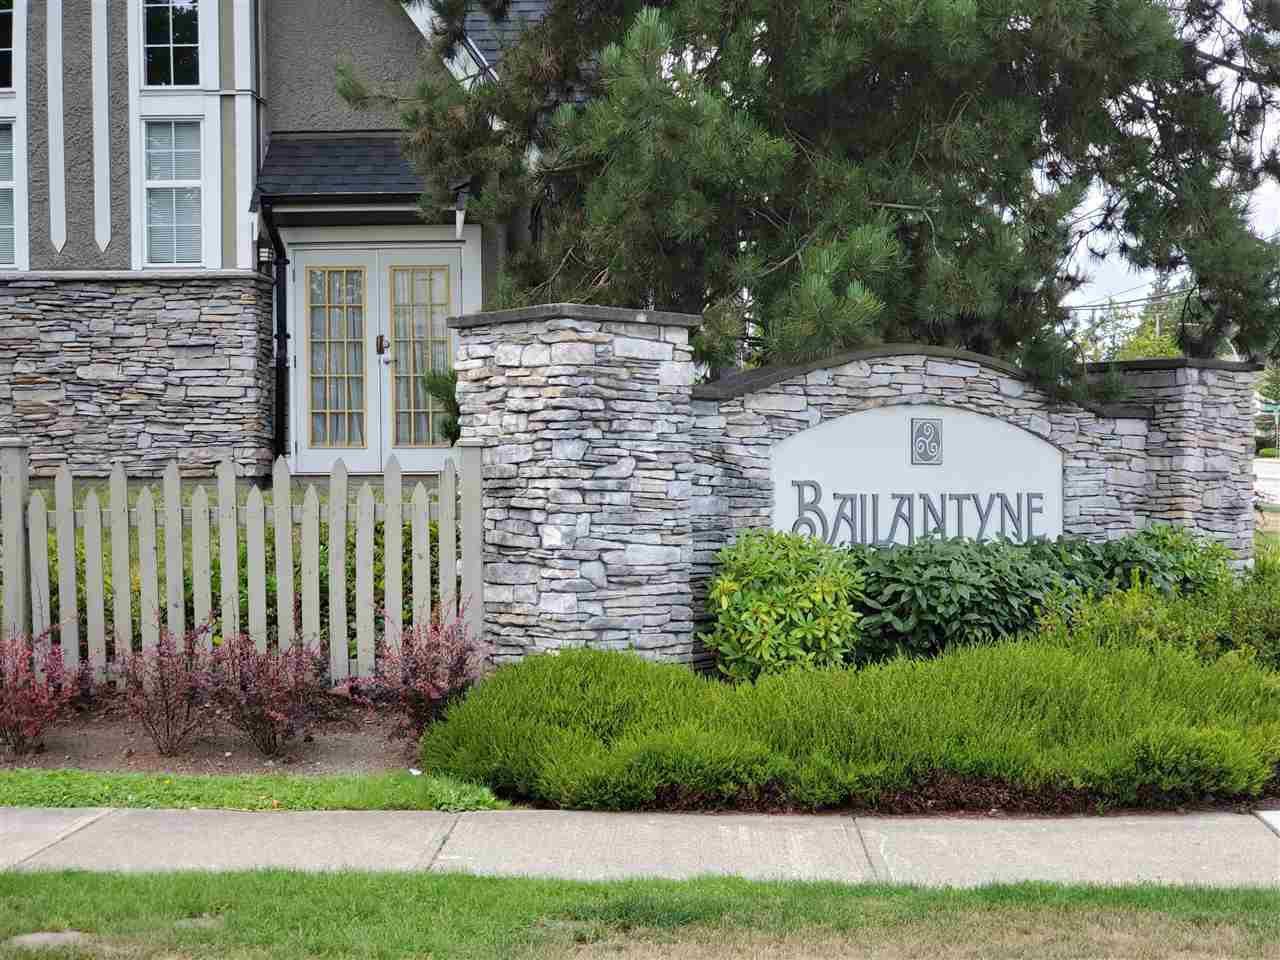 "Main Photo: 70 8775 161 Street in Surrey: Fleetwood Tynehead Townhouse for sale in ""BALLANTYNE"" : MLS®# R2488432"